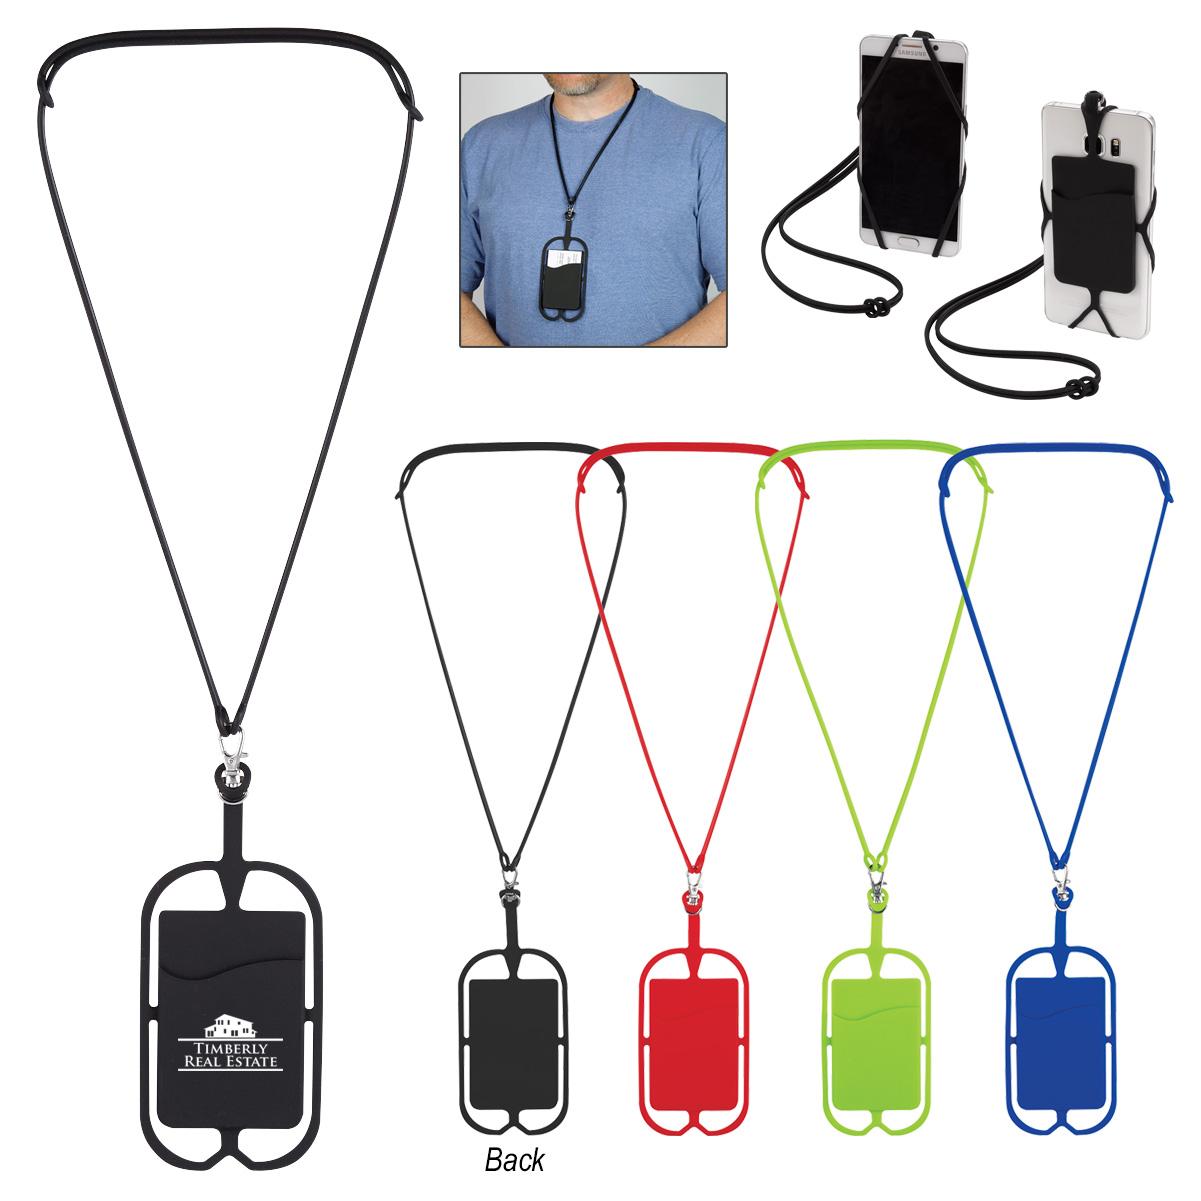 phone wallet- inexpensive- giveaway- local- tradeshow- eXpobranders